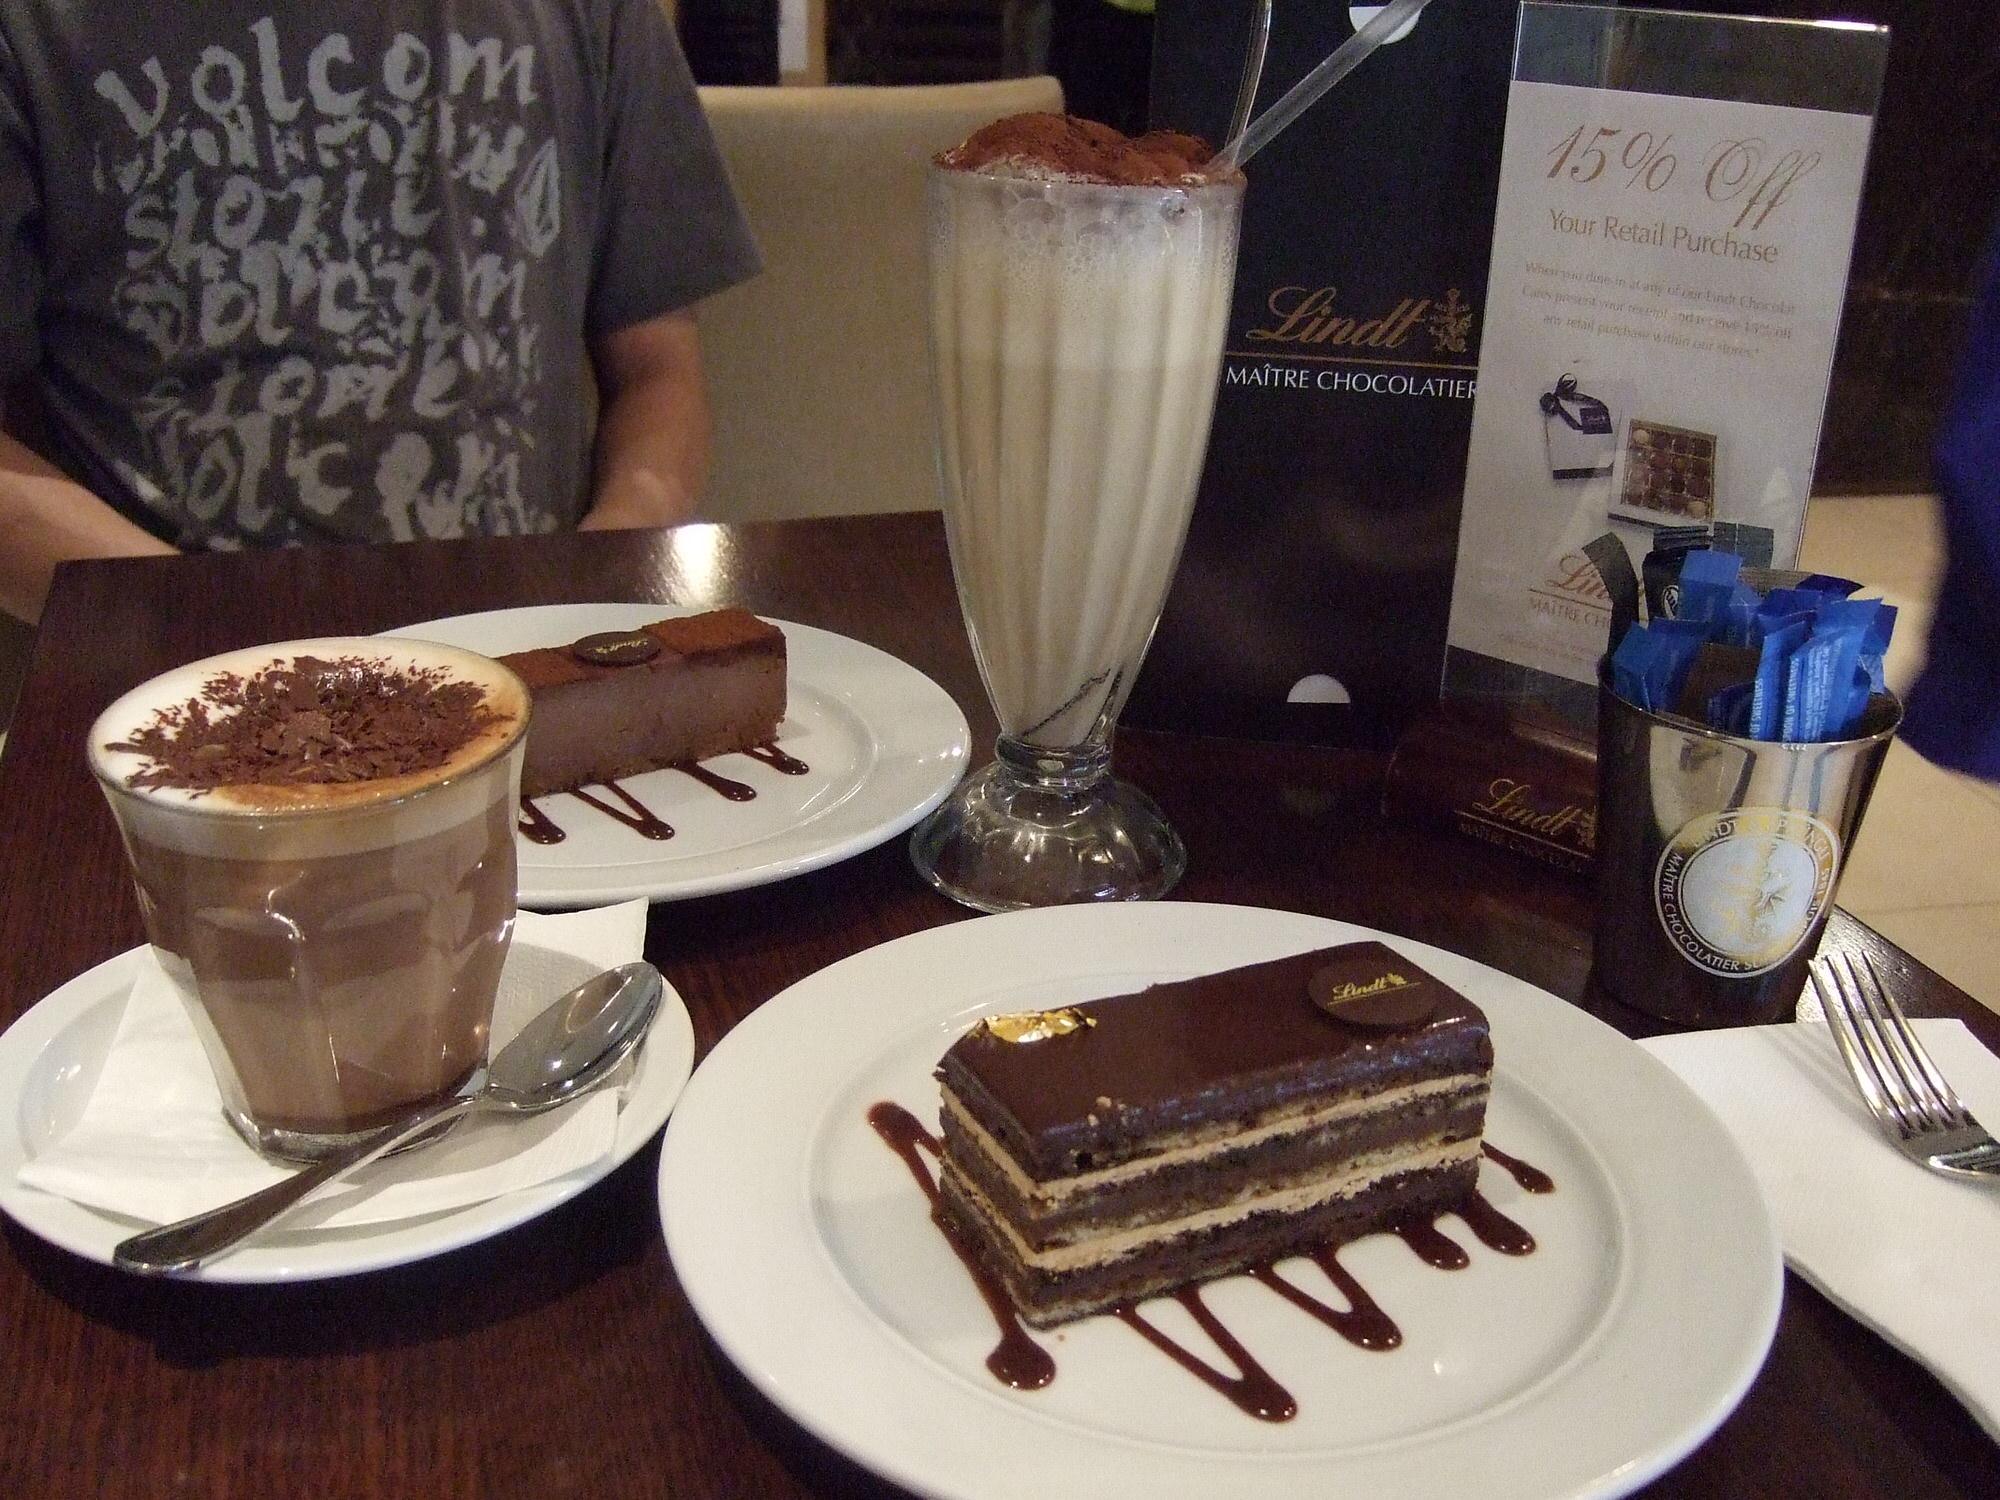 lindtcafe